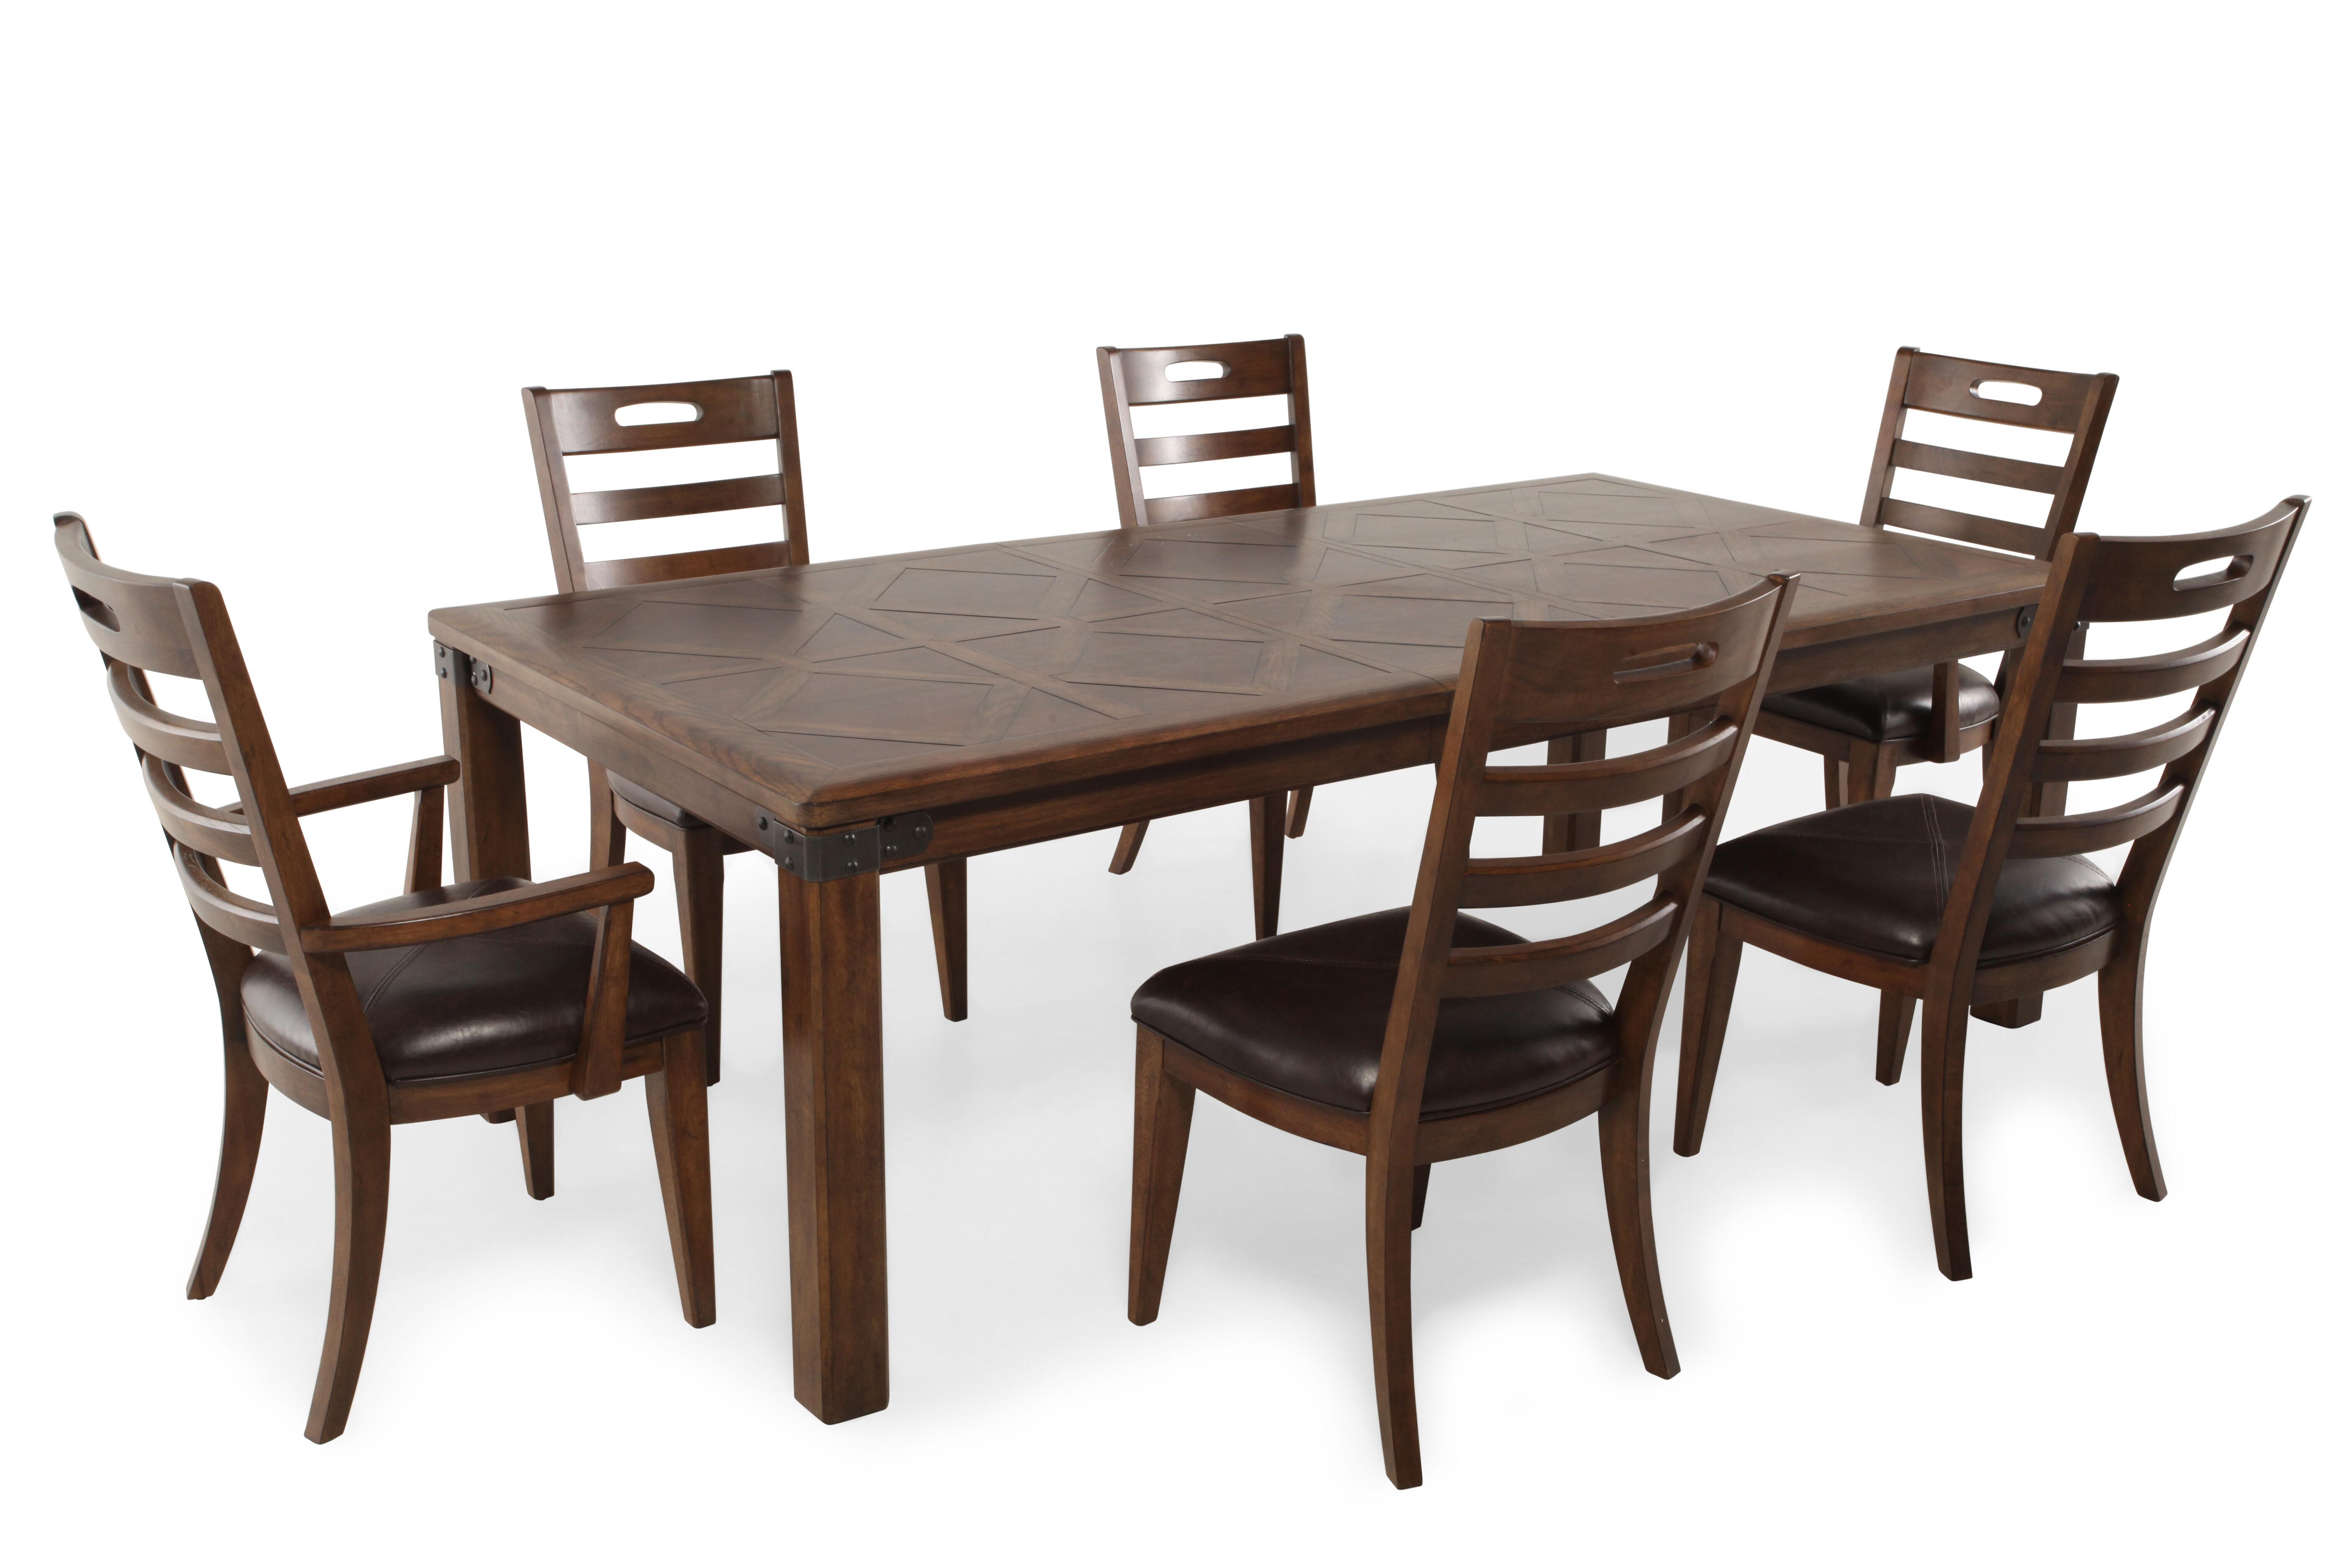 pulaski heartland falls sevenpiece dining set